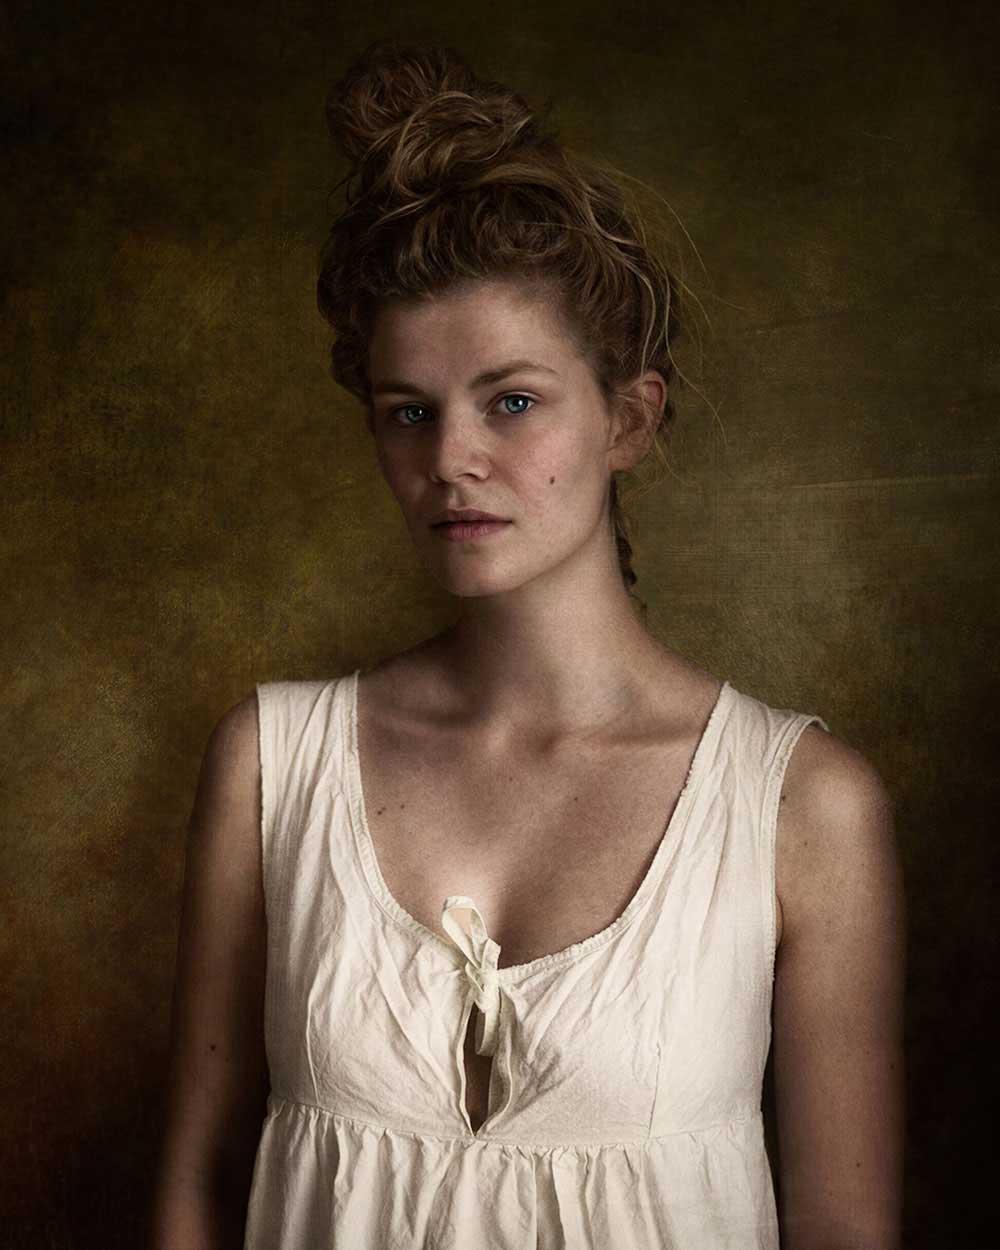 Mariëtte Aernoudts | Fine art photography